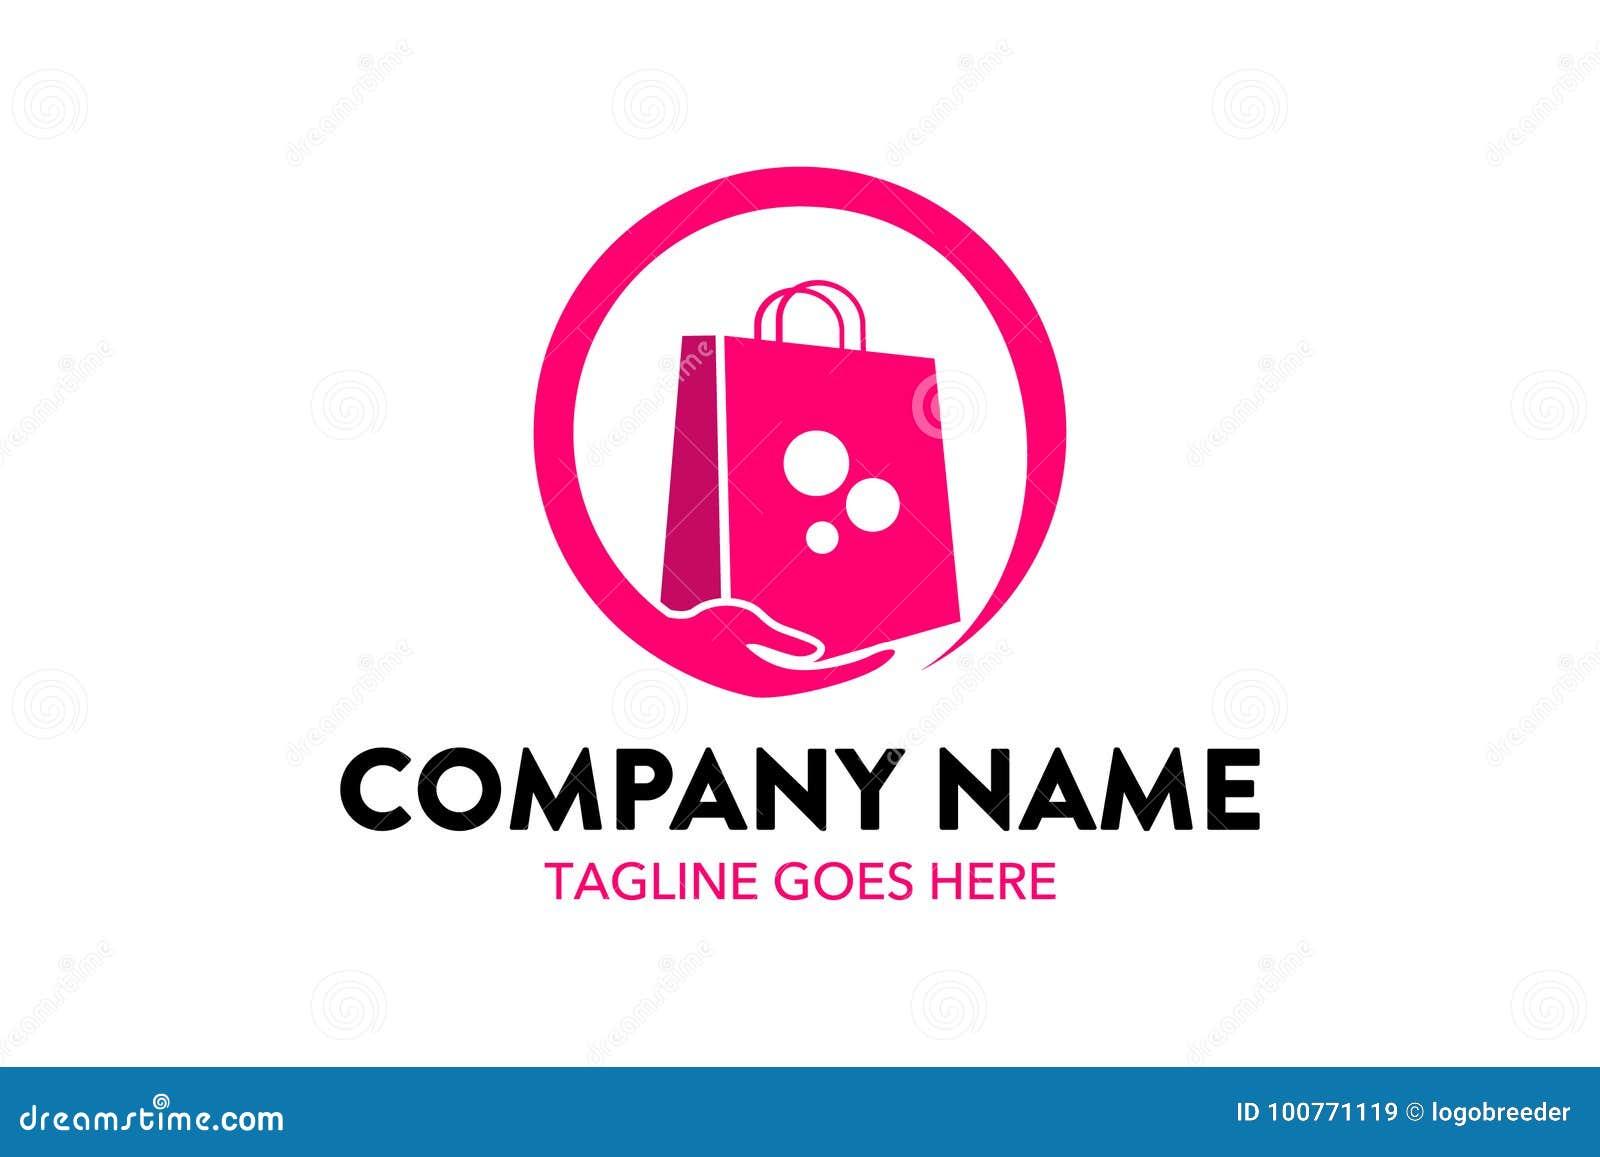 Supermarket Shopping Cart Logo Template Stock Illustrations – 516 ...